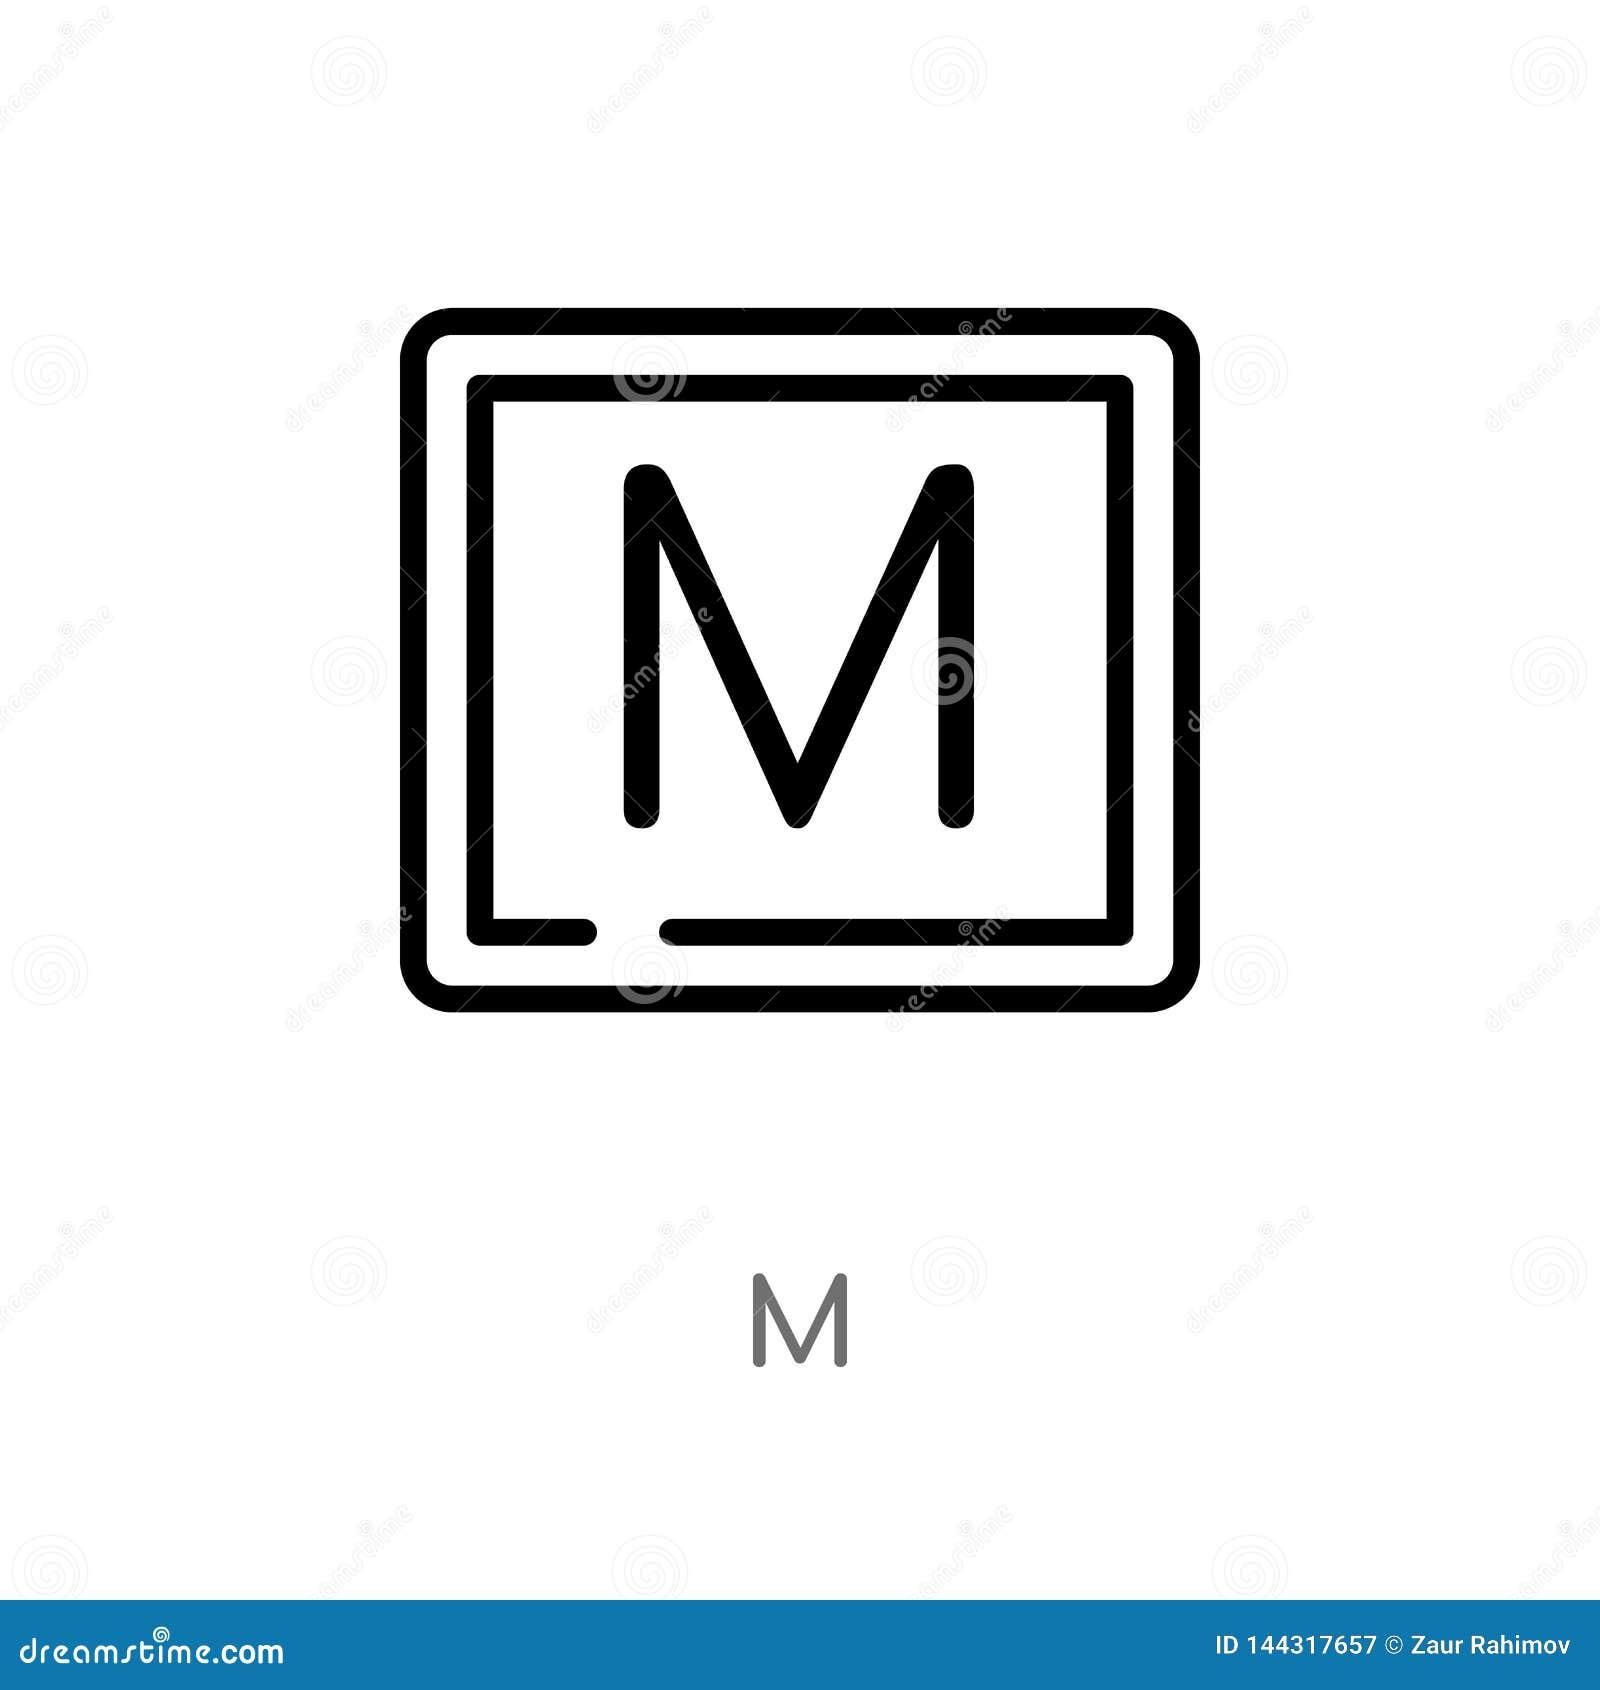 Icono del vector del esquema m l?nea simple negra aislada ejemplo del elemento de se?alar concepto icono editable del movimiento